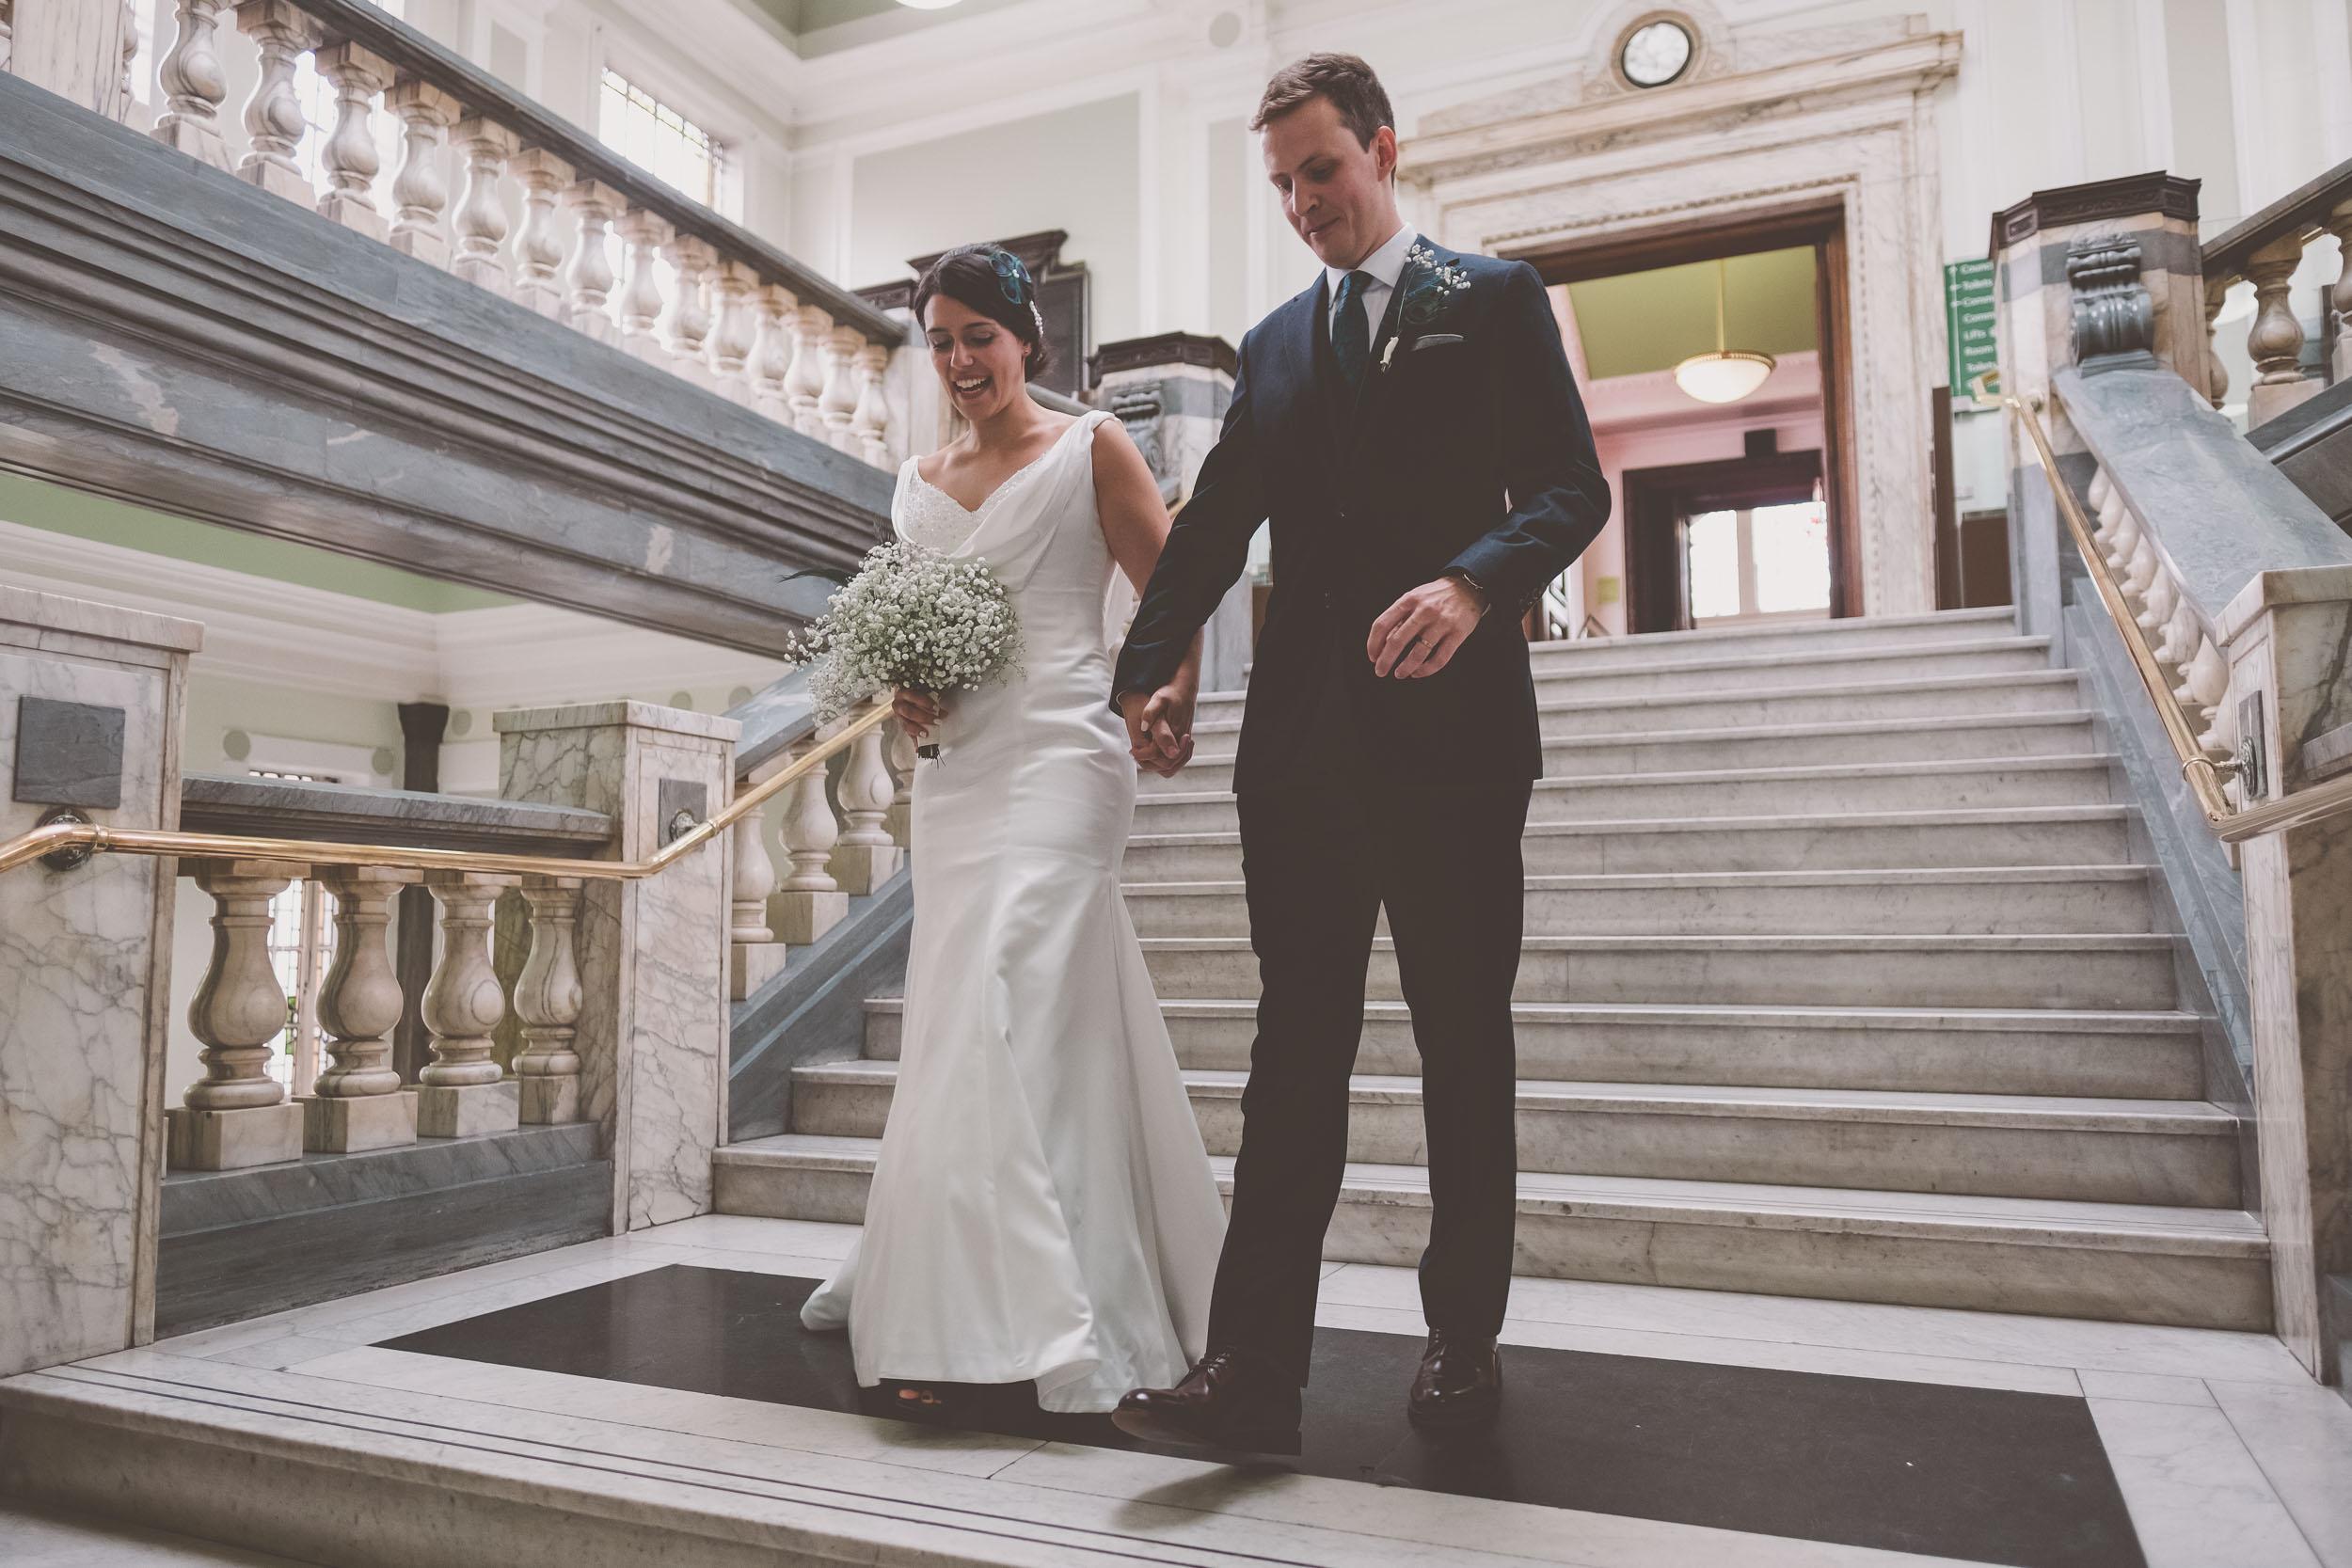 islington-town-hall-4th-floor-studios-wedding141.jpg